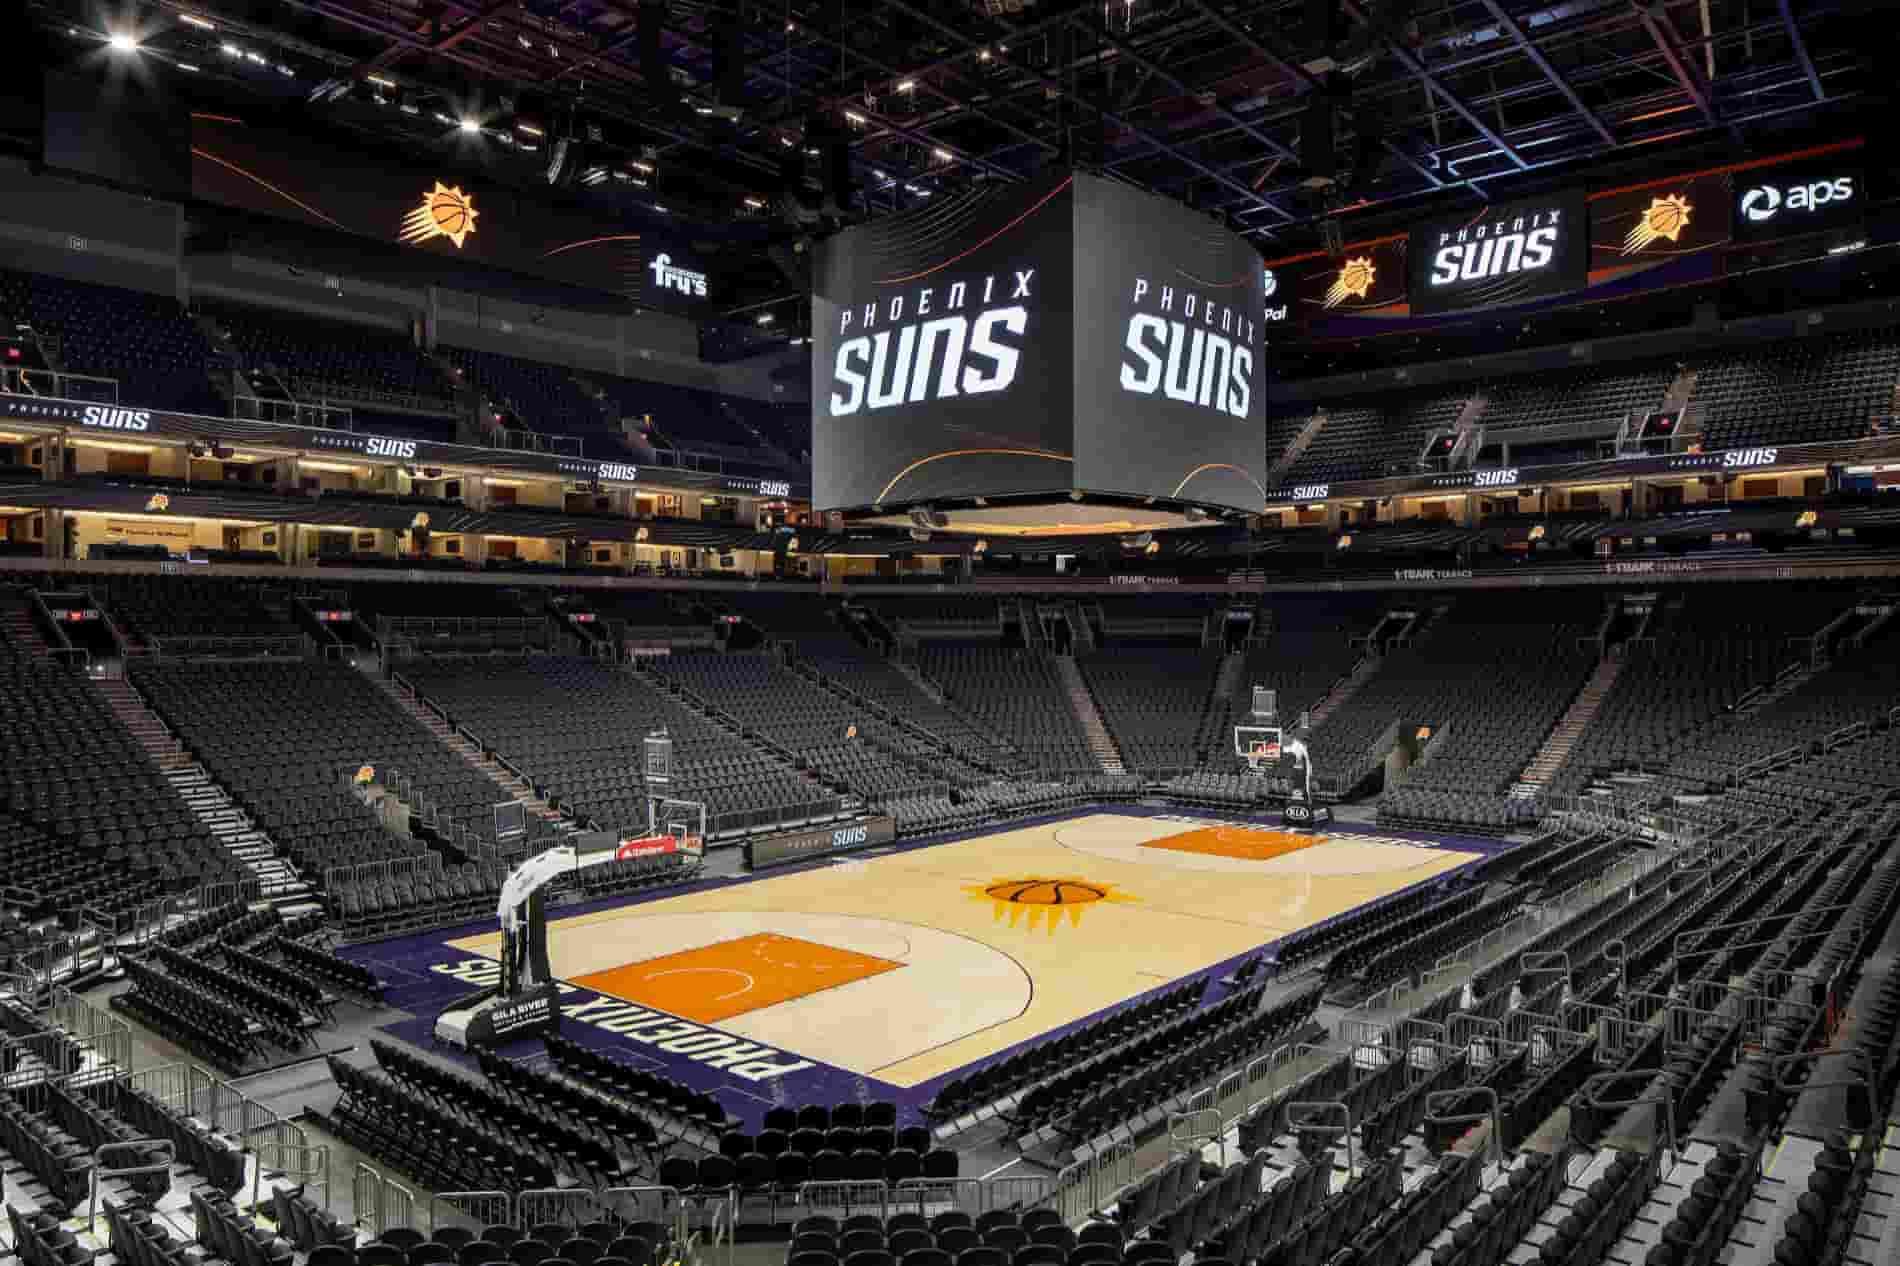 Watch Suns vs Bucks NBA Finals Game 2 free live Streams Reddit